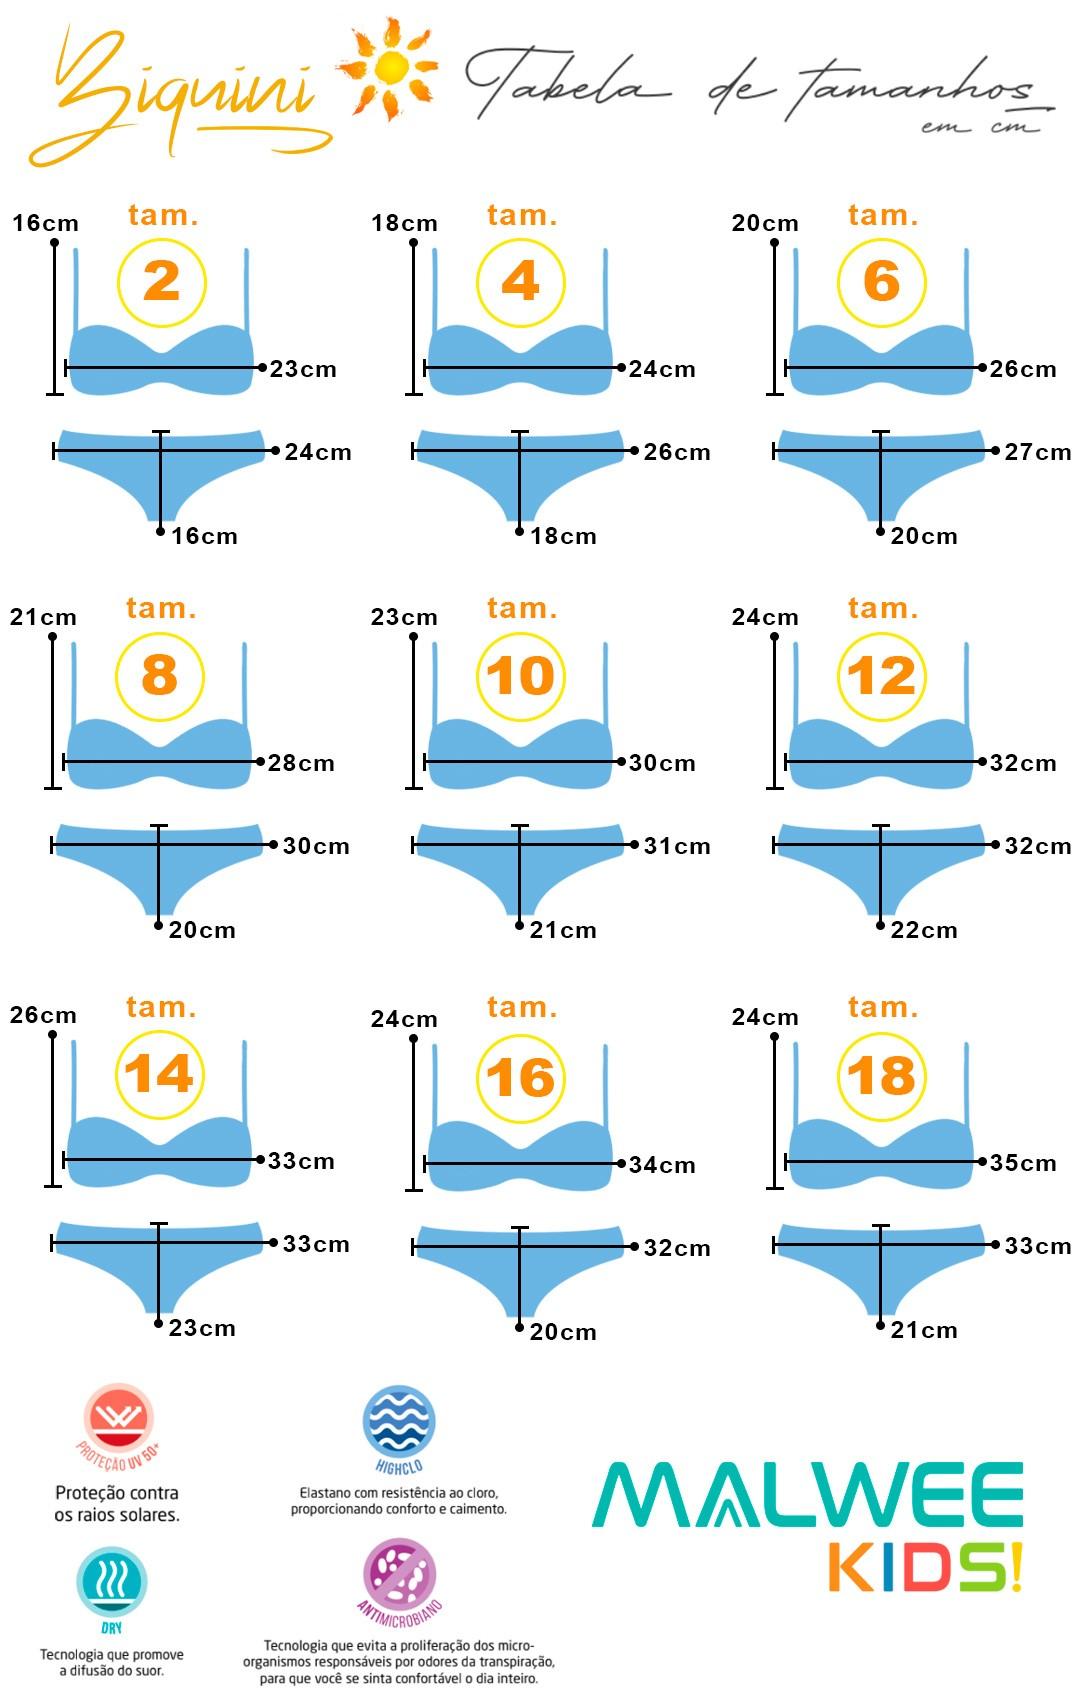 Biquini Infantil Proteção UV 50+ Rosa Raios - Malwee: Tabela de medidas